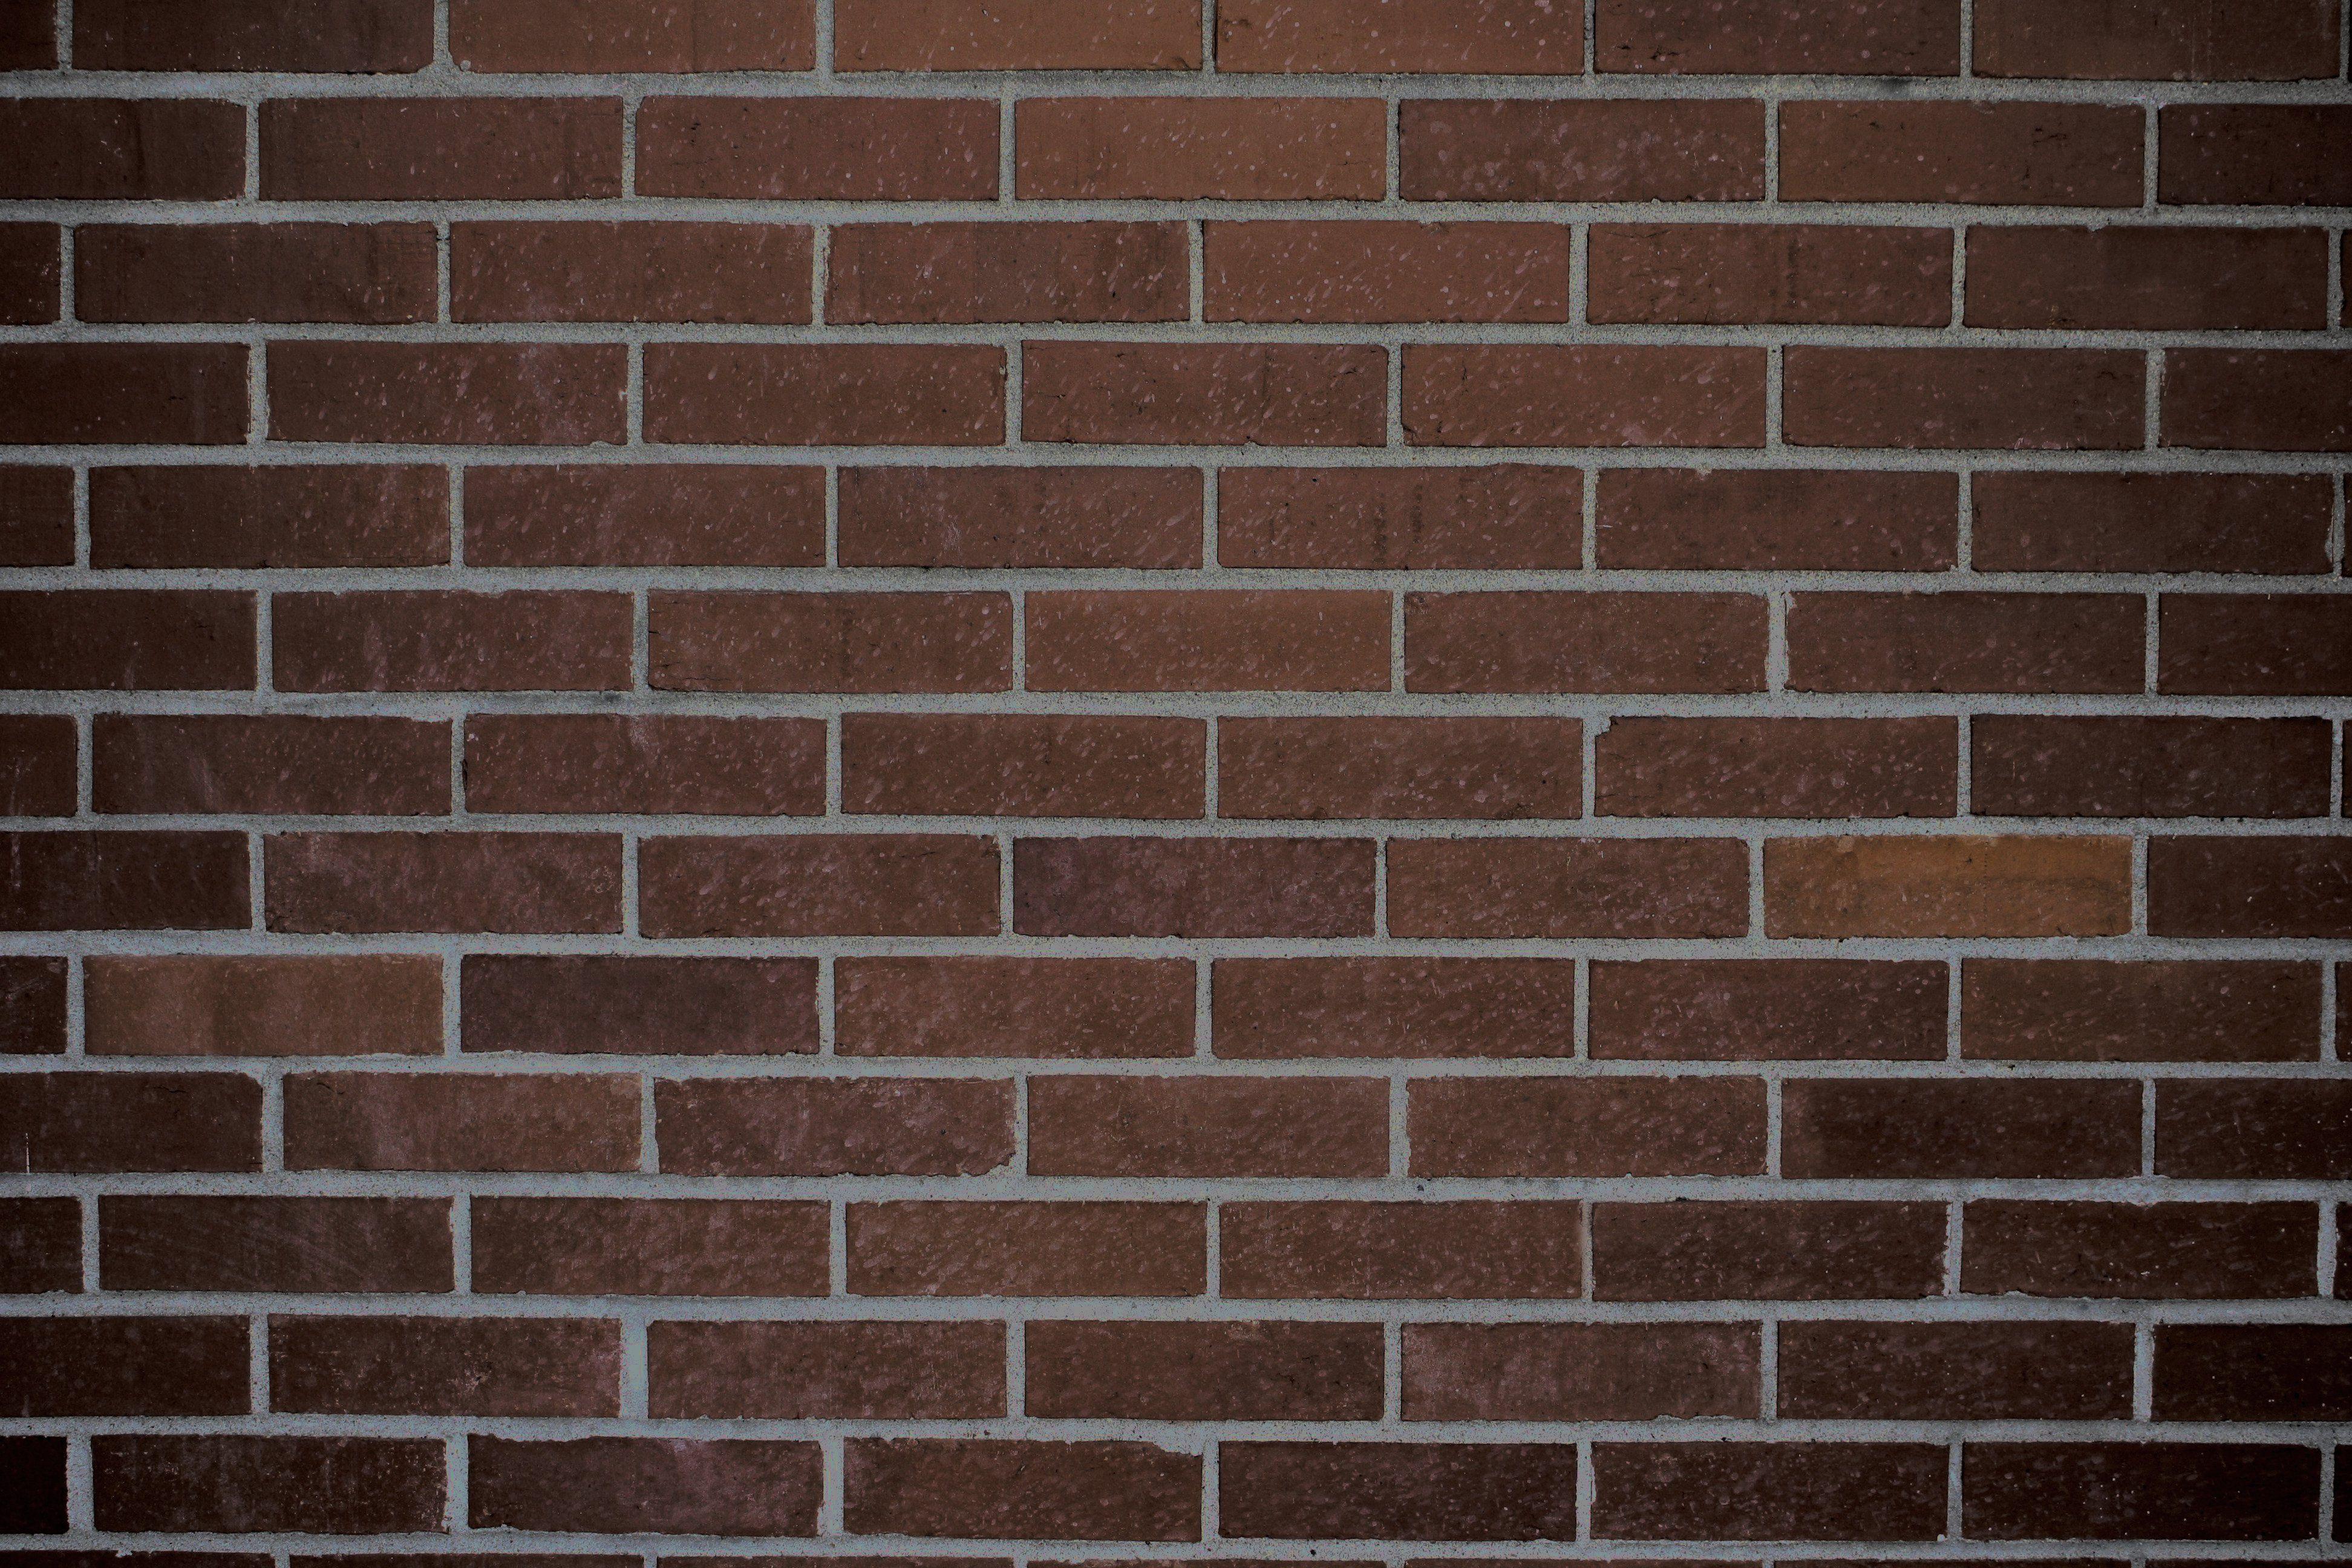 Dark Brown Brick Wall Texture